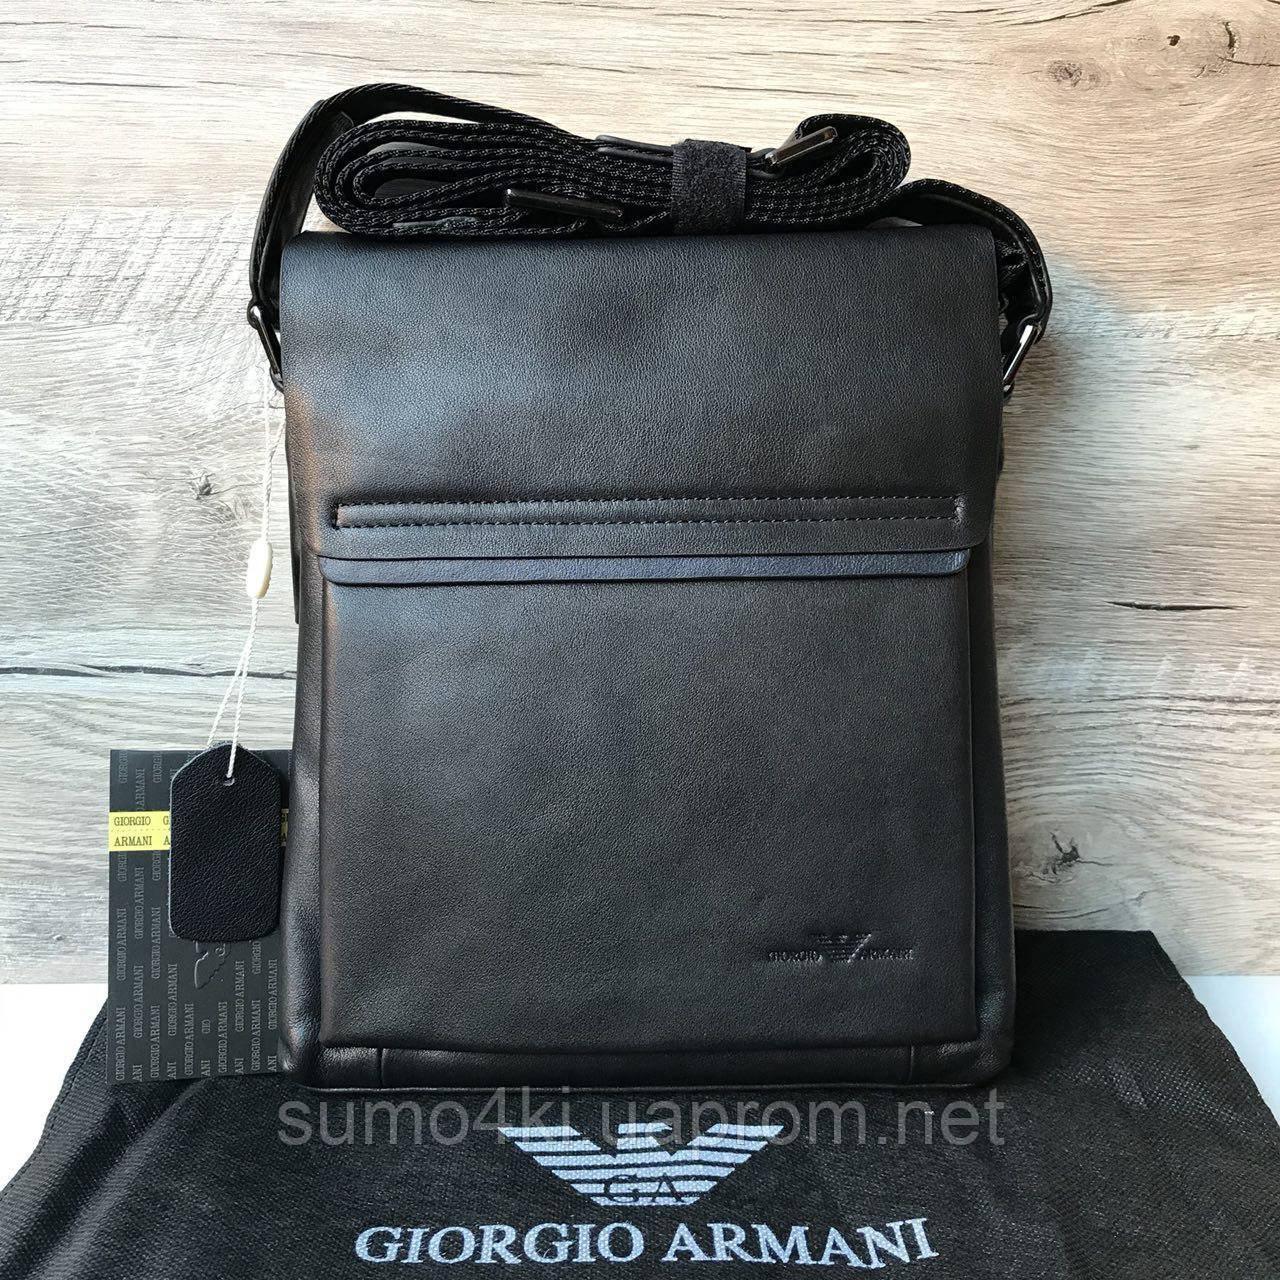 fd8e211aabb7 Купить Мужскую кожаную сумку через плечо Armani Армани оптом и в ...